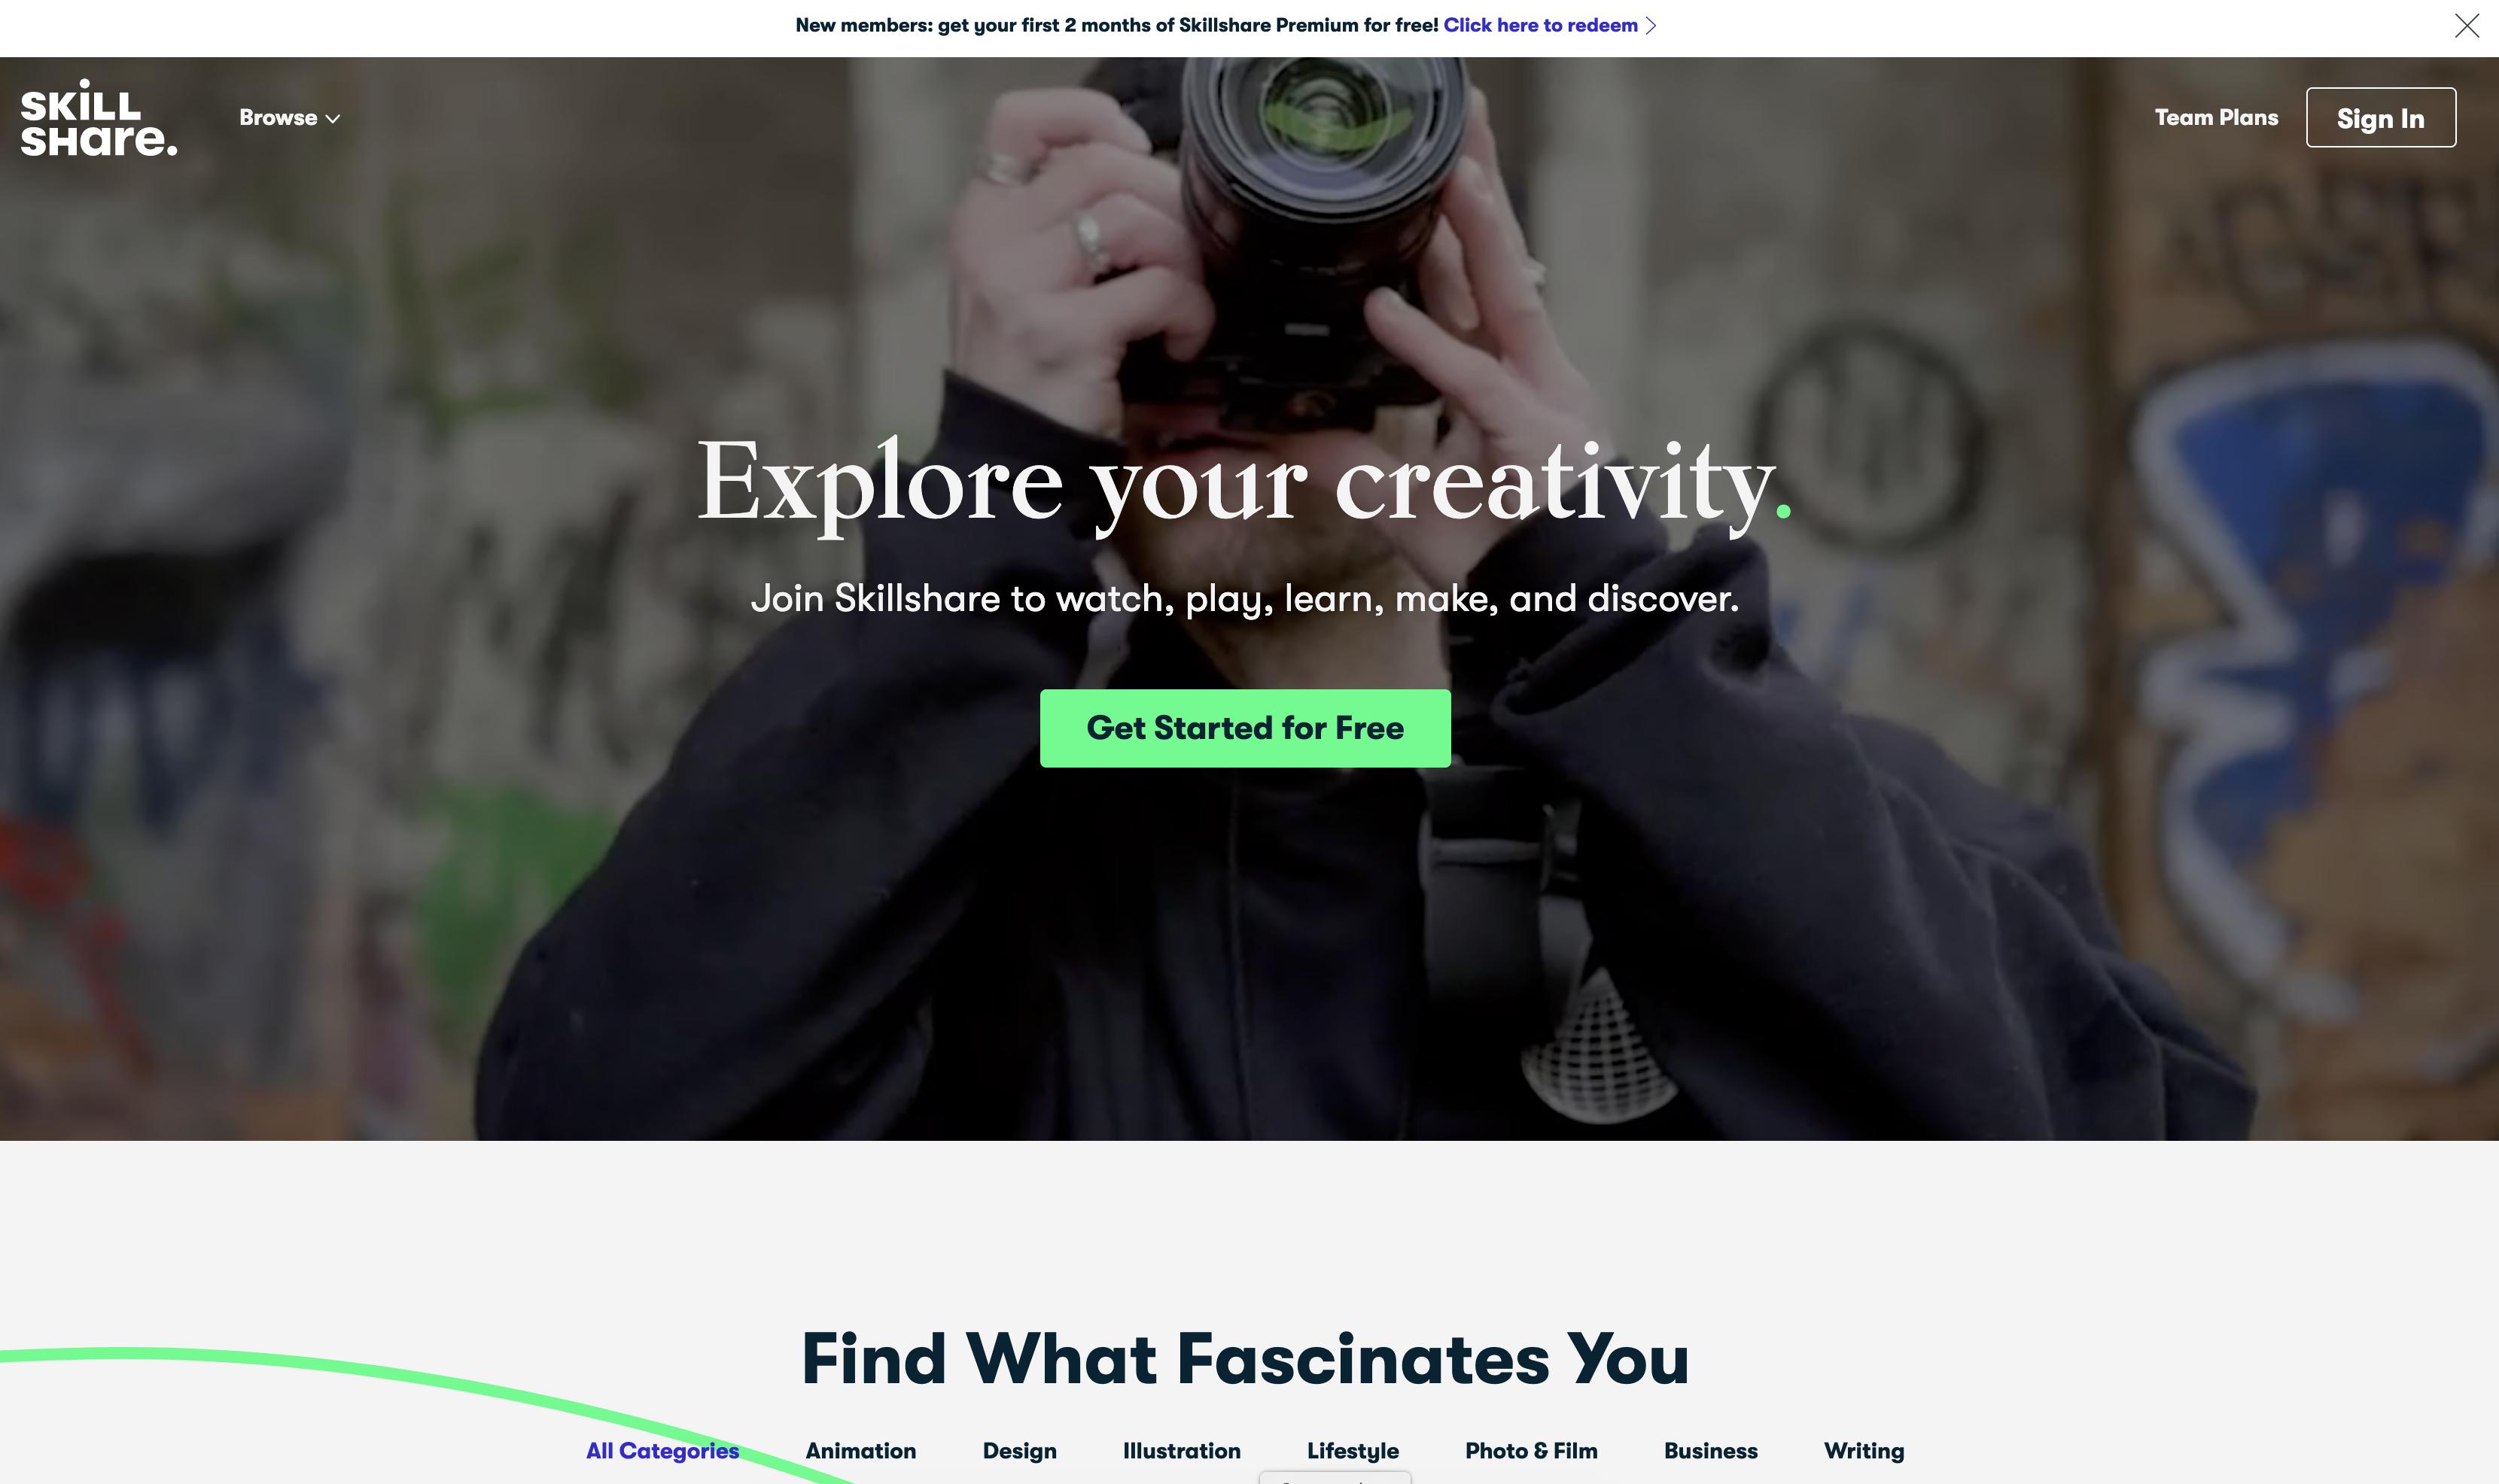 skillshare content creation tools